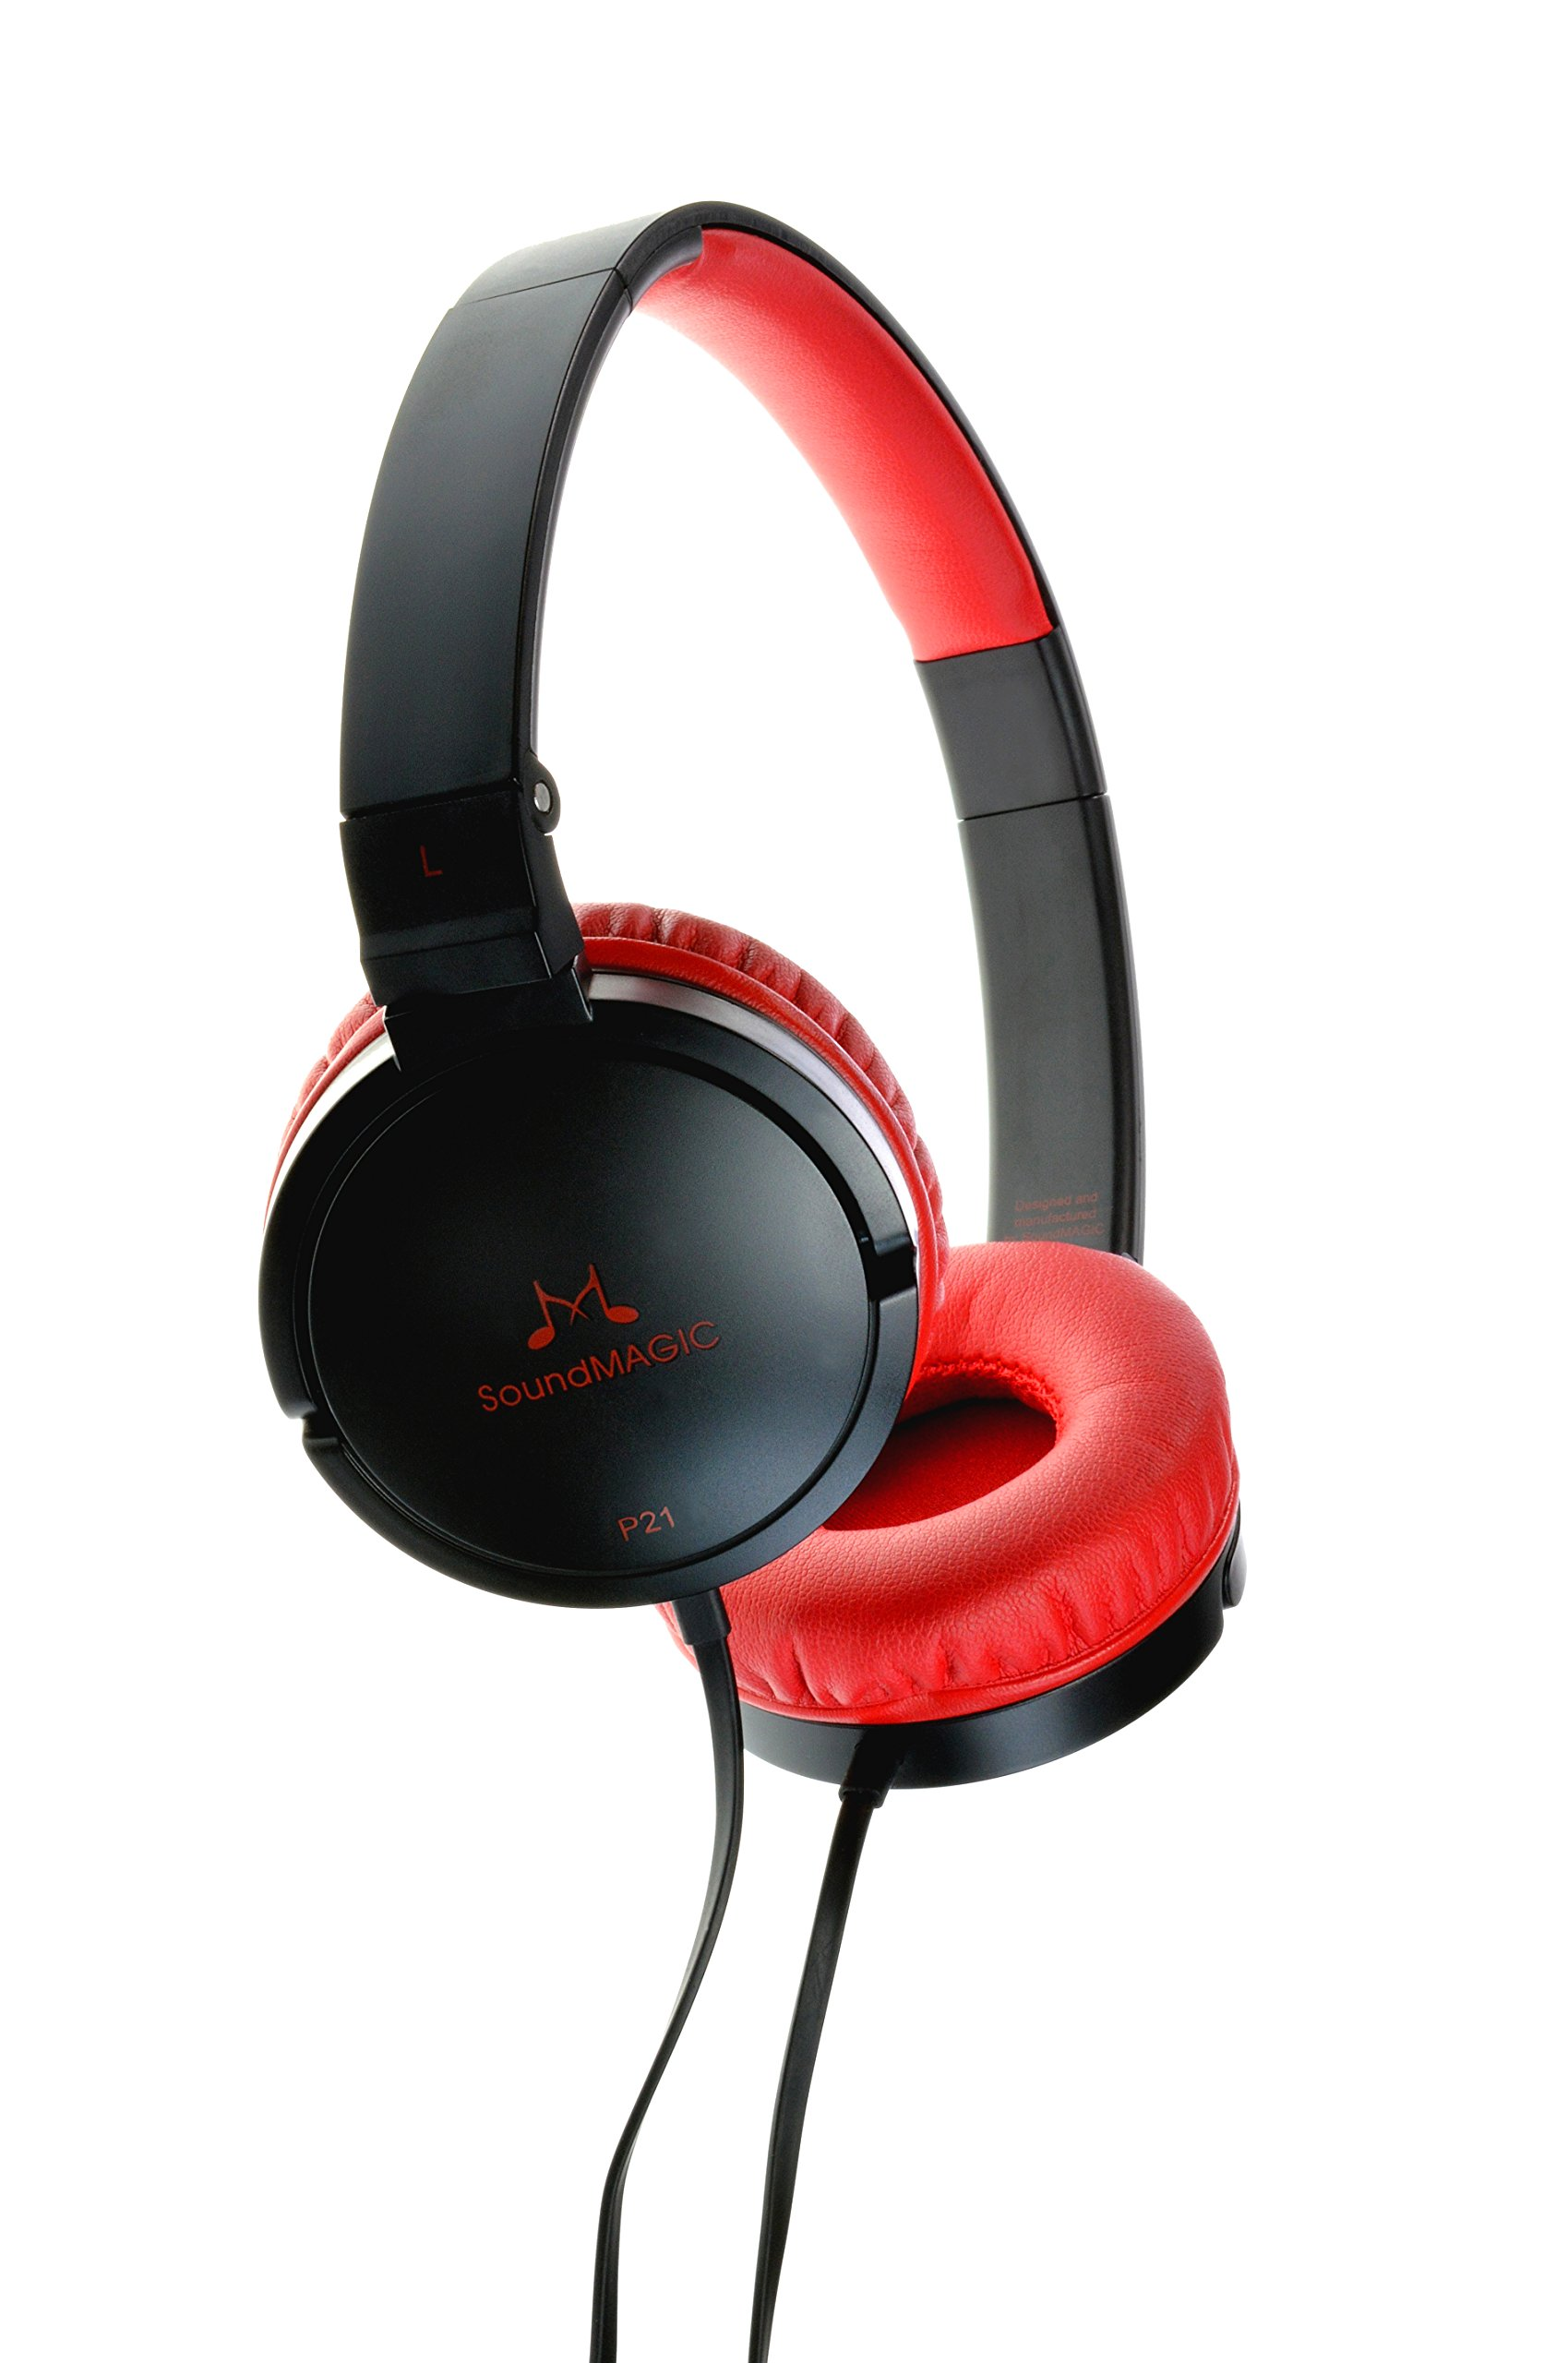 SoundMAGIC Headphones Black/Red (P21 Black/Red)